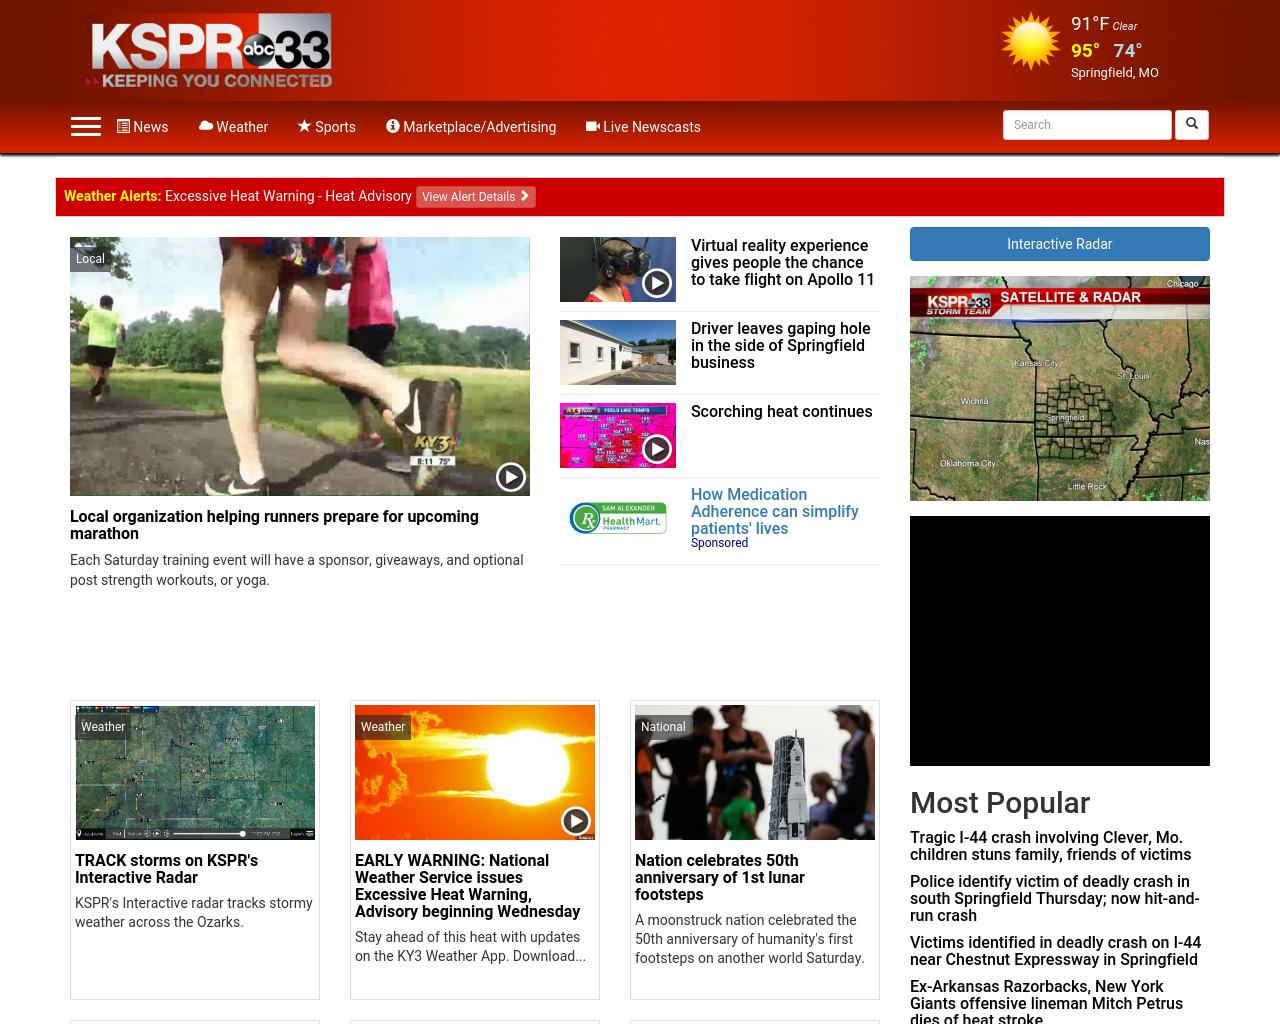 KSPR 33 Advertising Mediakits, Reviews, Pricing, Traffic